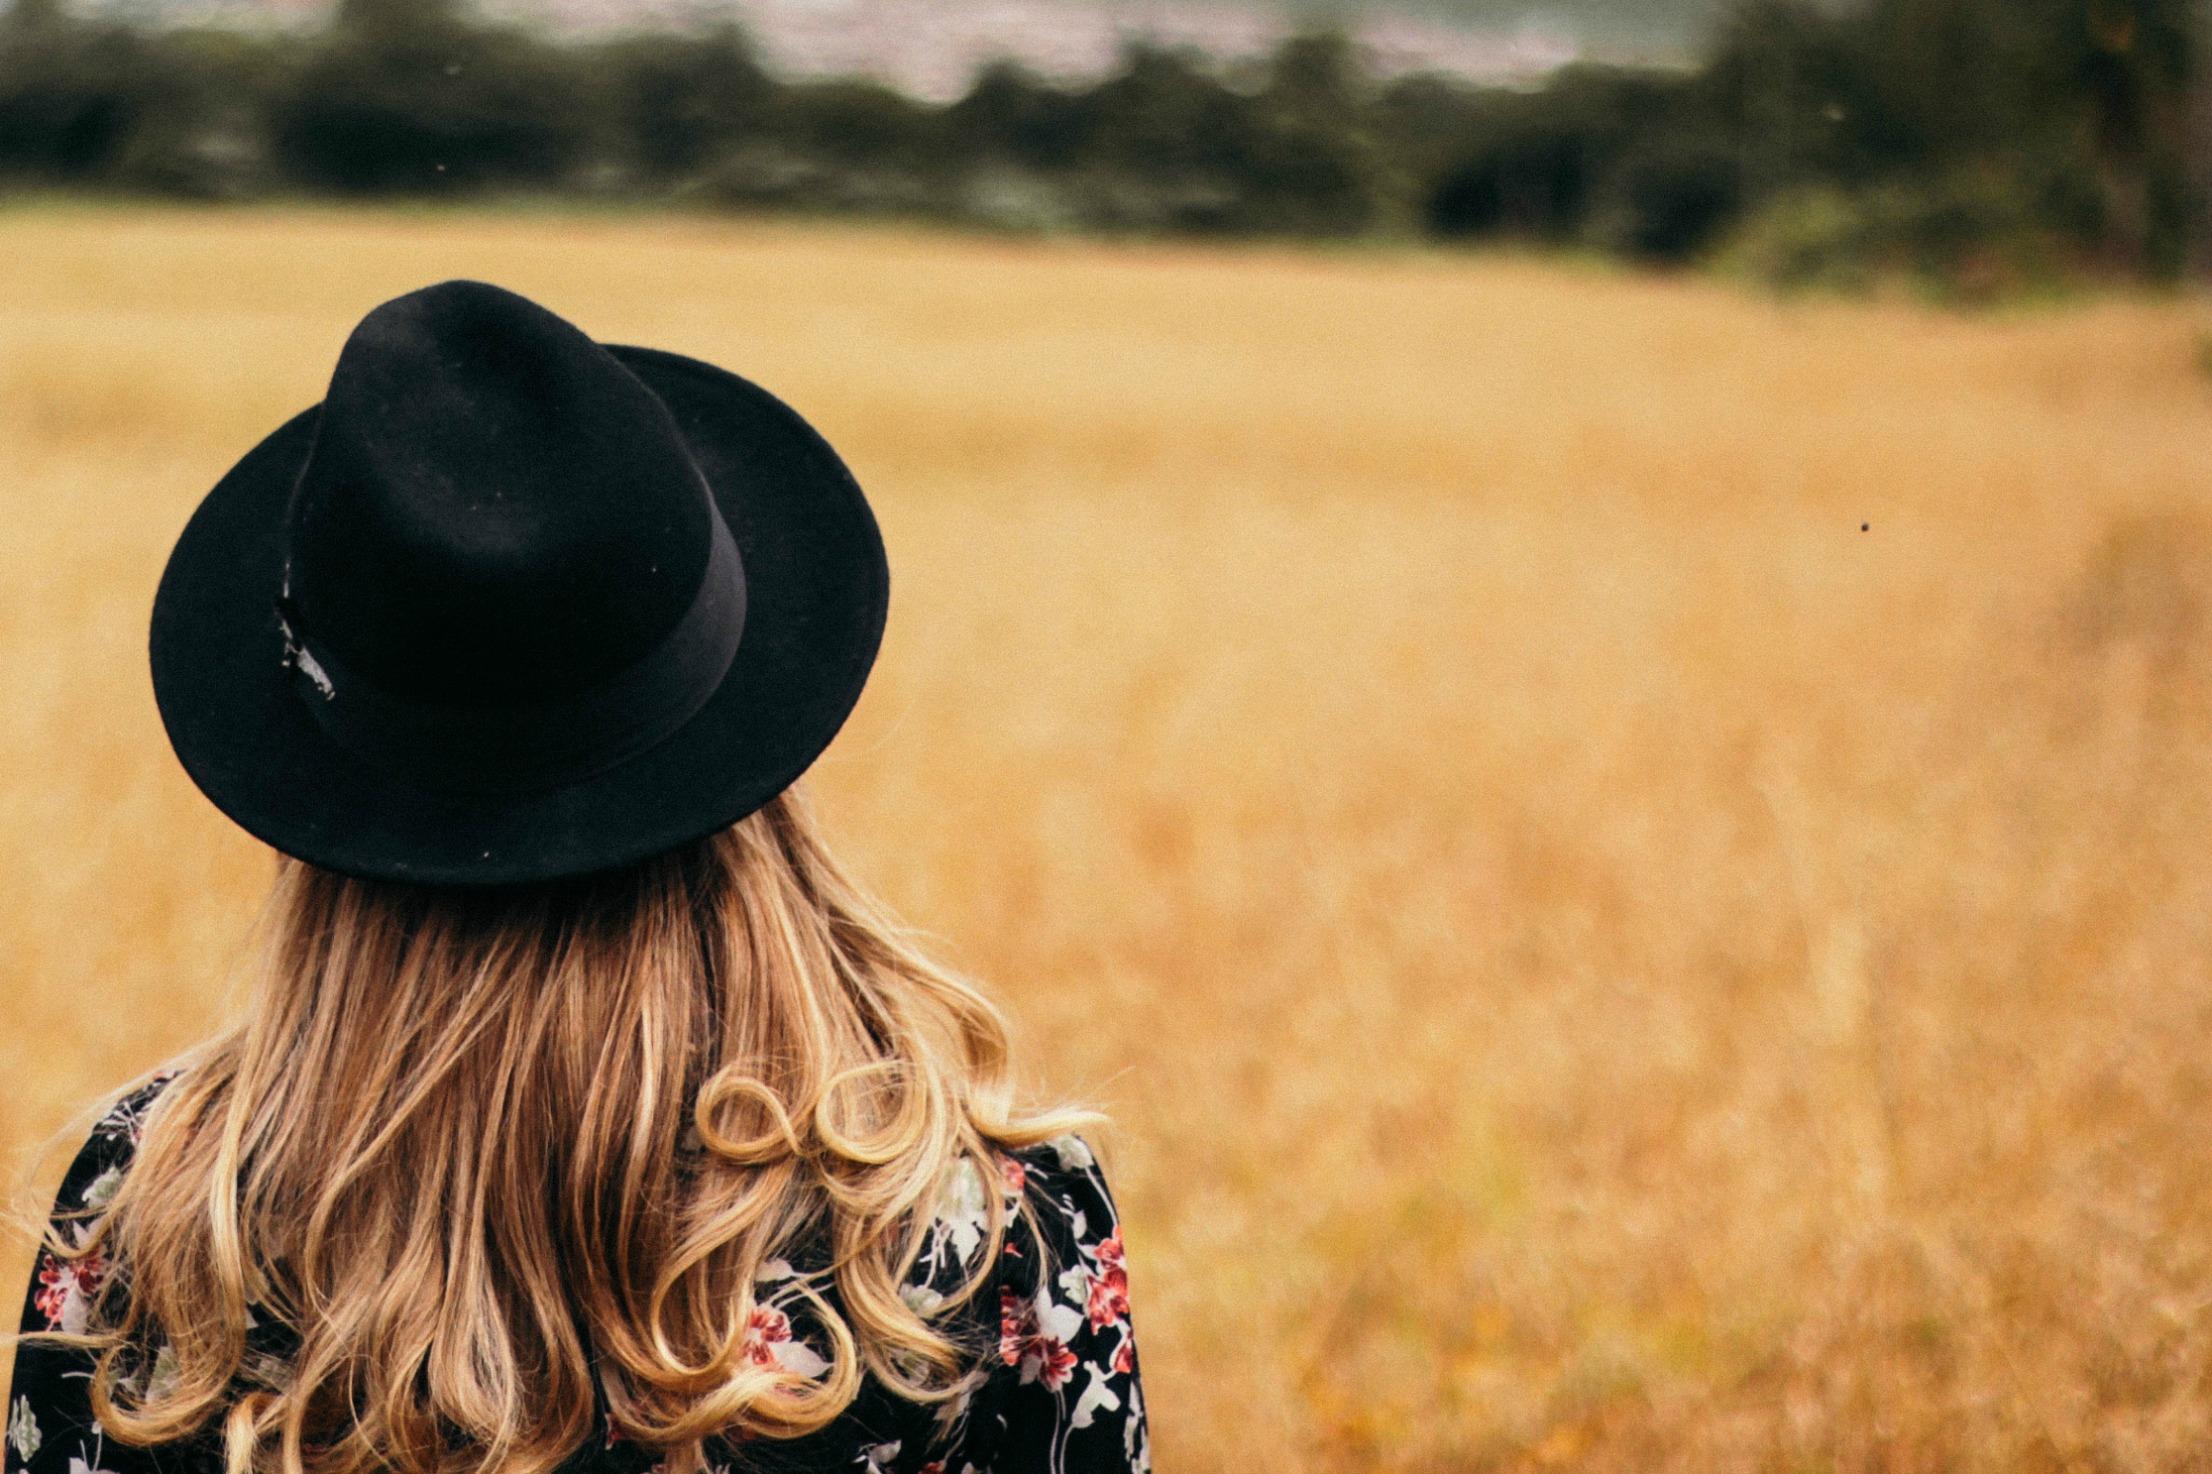 How to find myself after divorce